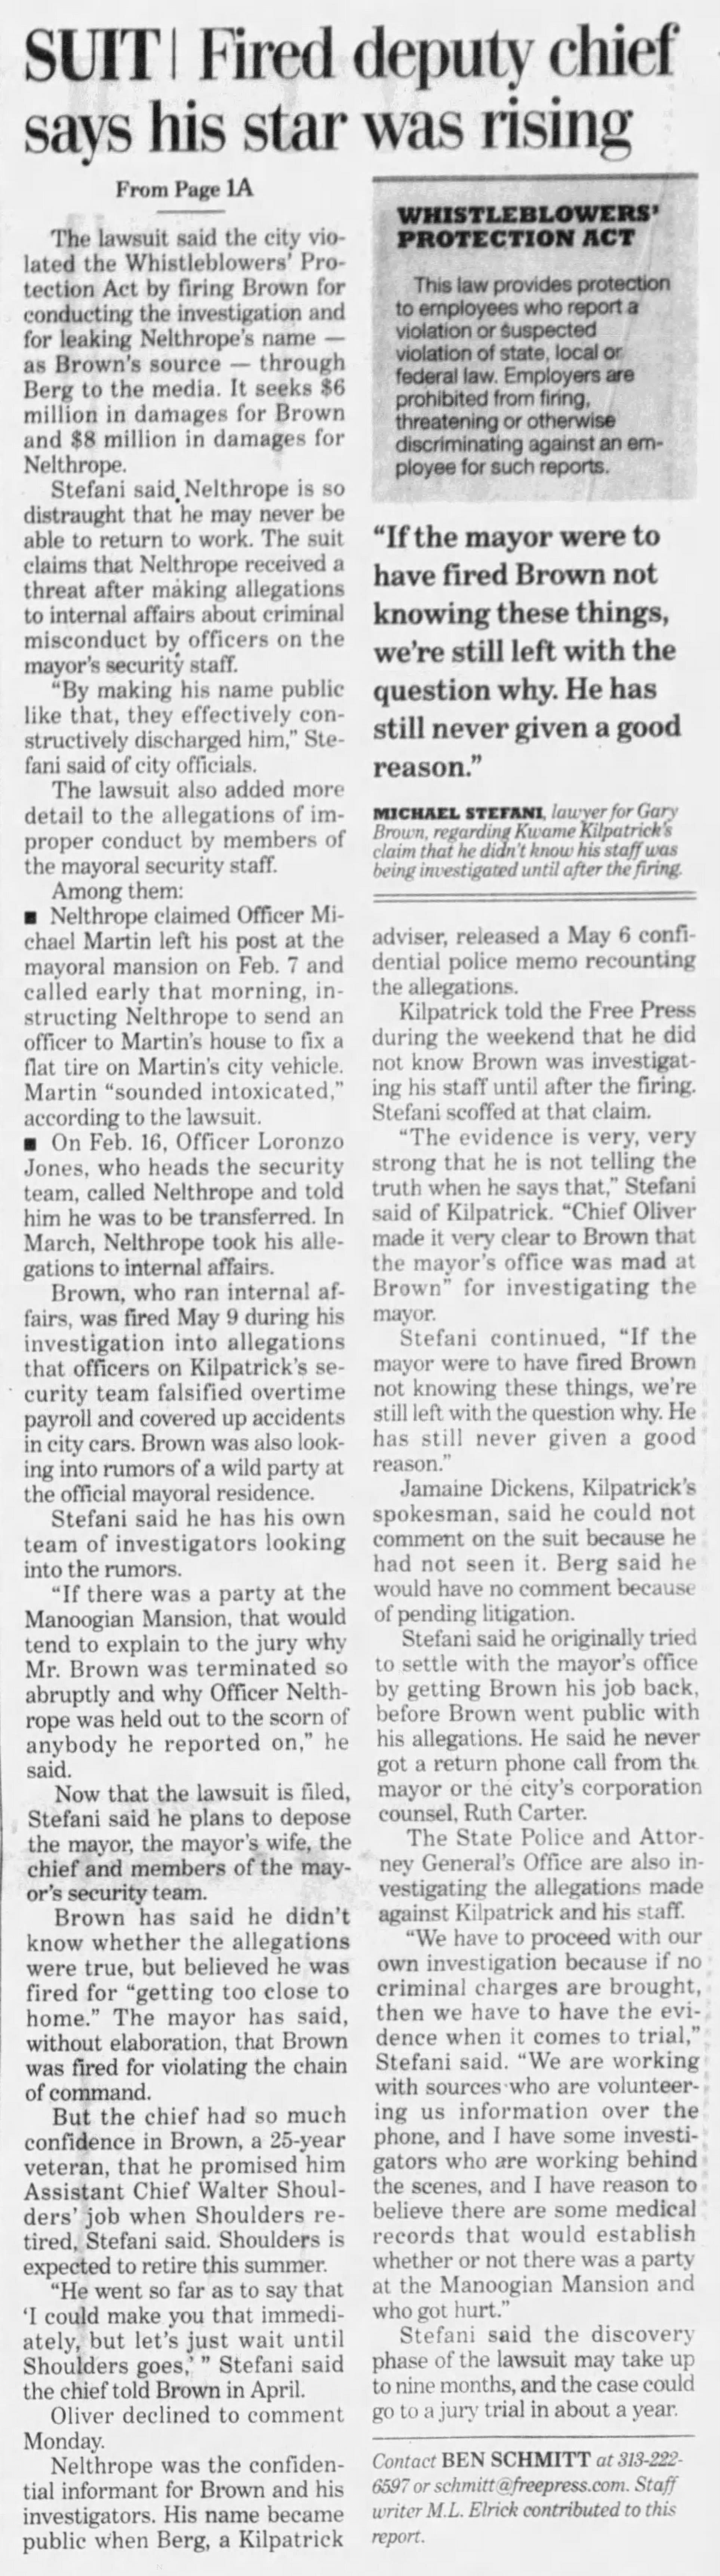 Detroit_Free_Press_Tue__Jun_3__2003_ (1).jpg